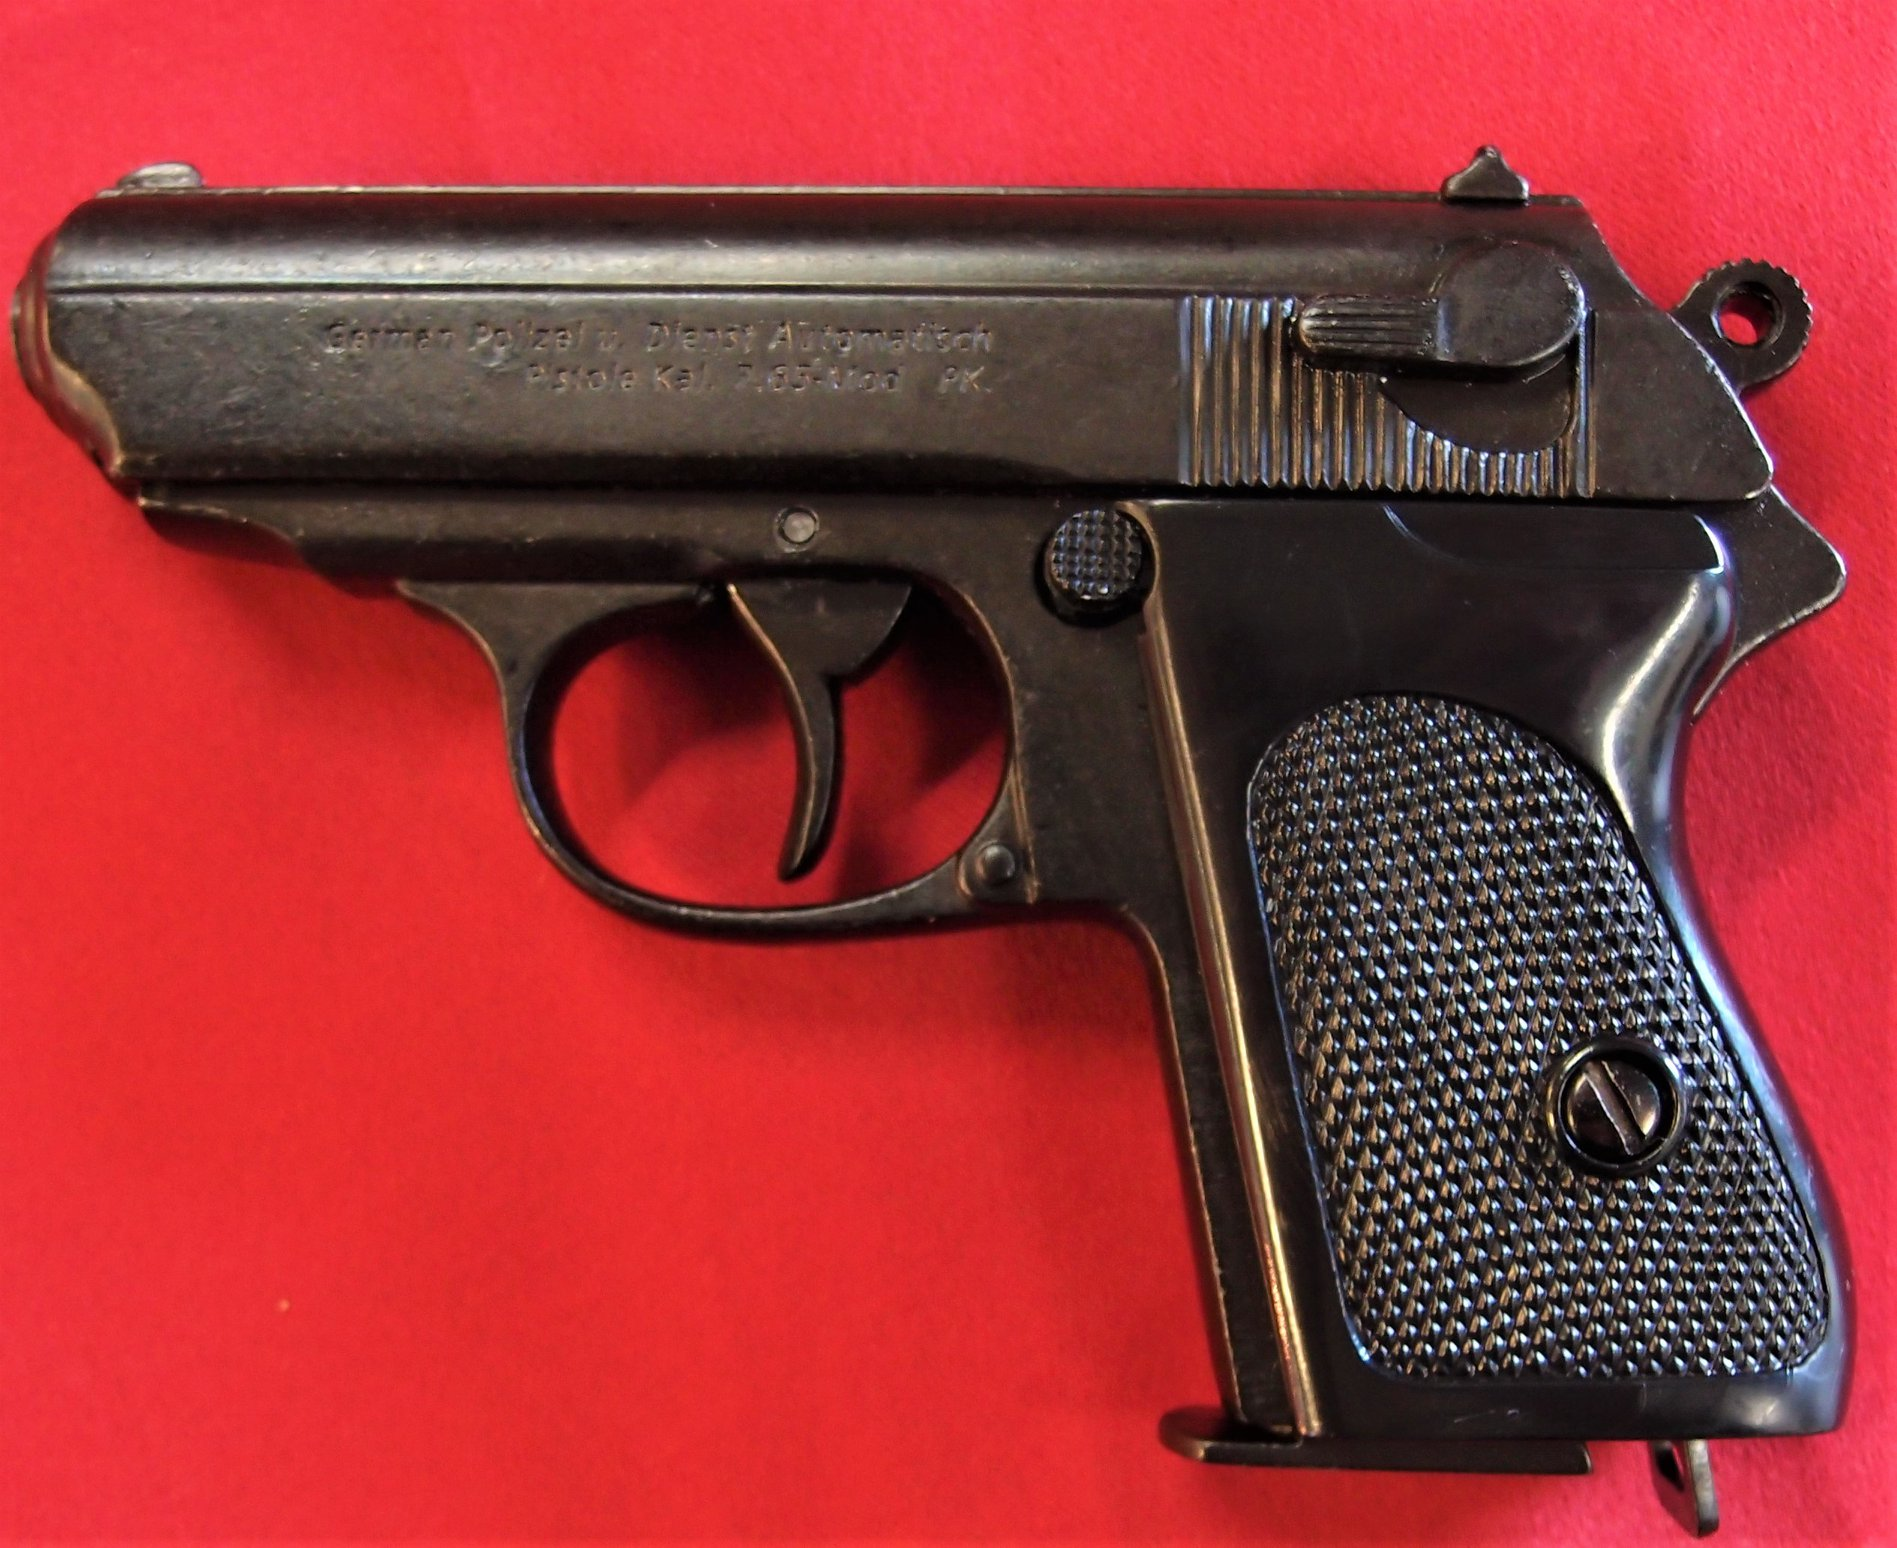 DENIX REPLICA GUN WALTHER PPK JAMES BOND STYLE PISTOL - JB ...